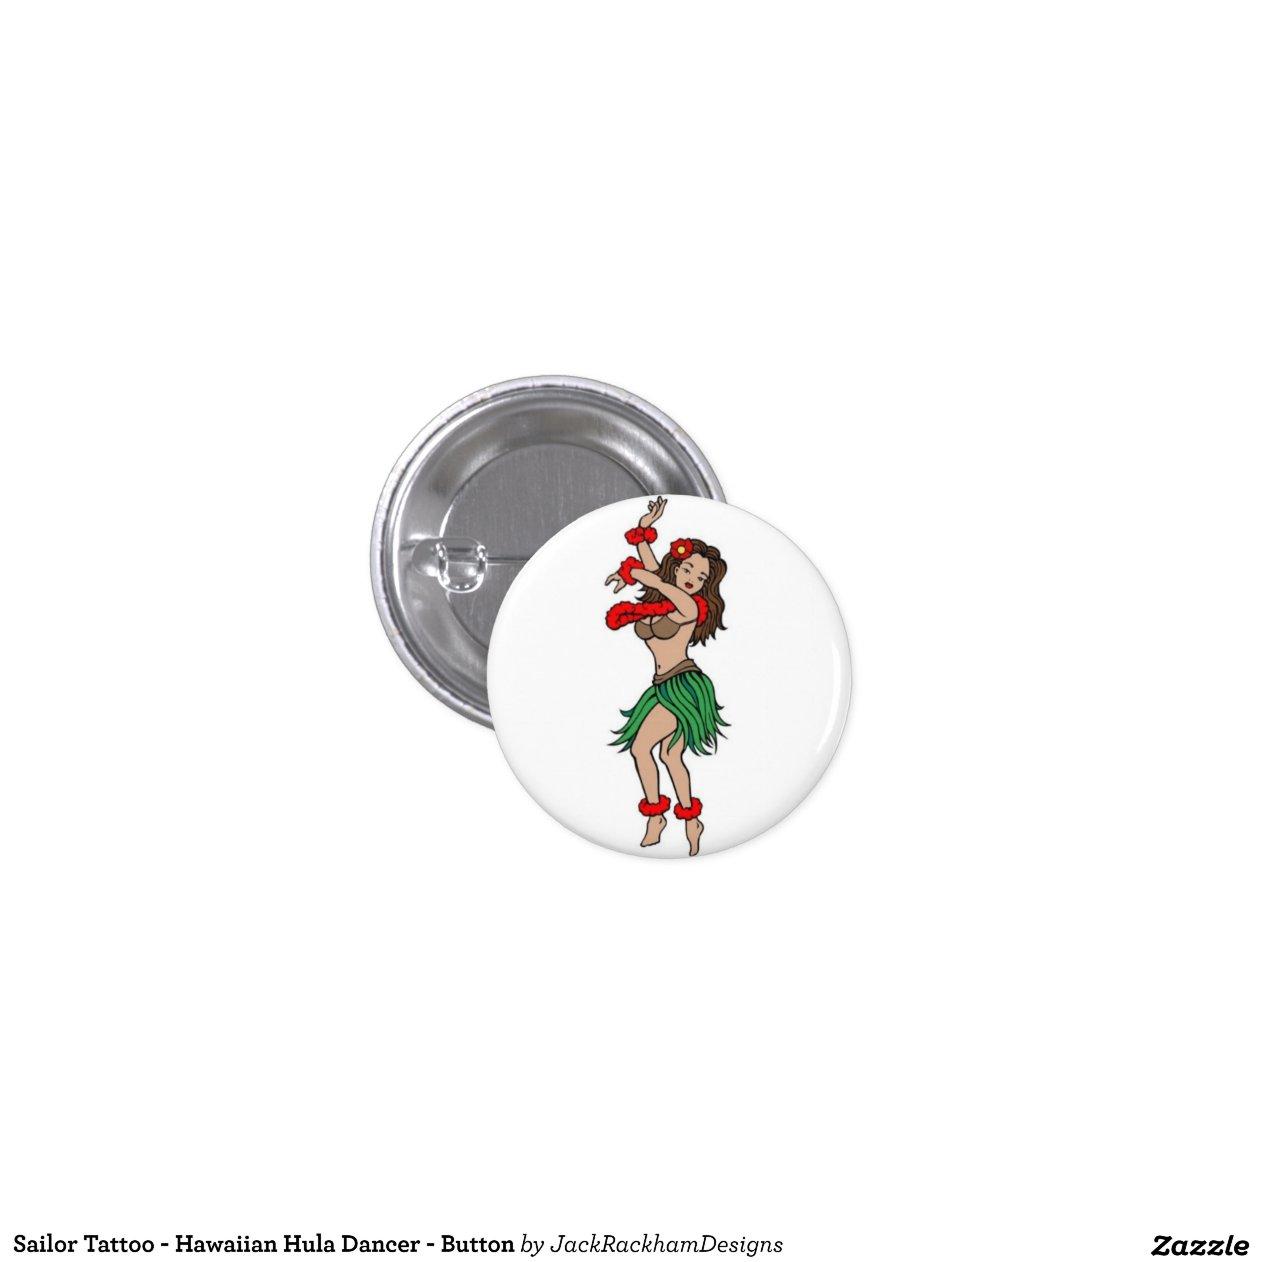 sailor tattoo hawaiian hula dancer button zazzle. Black Bedroom Furniture Sets. Home Design Ideas